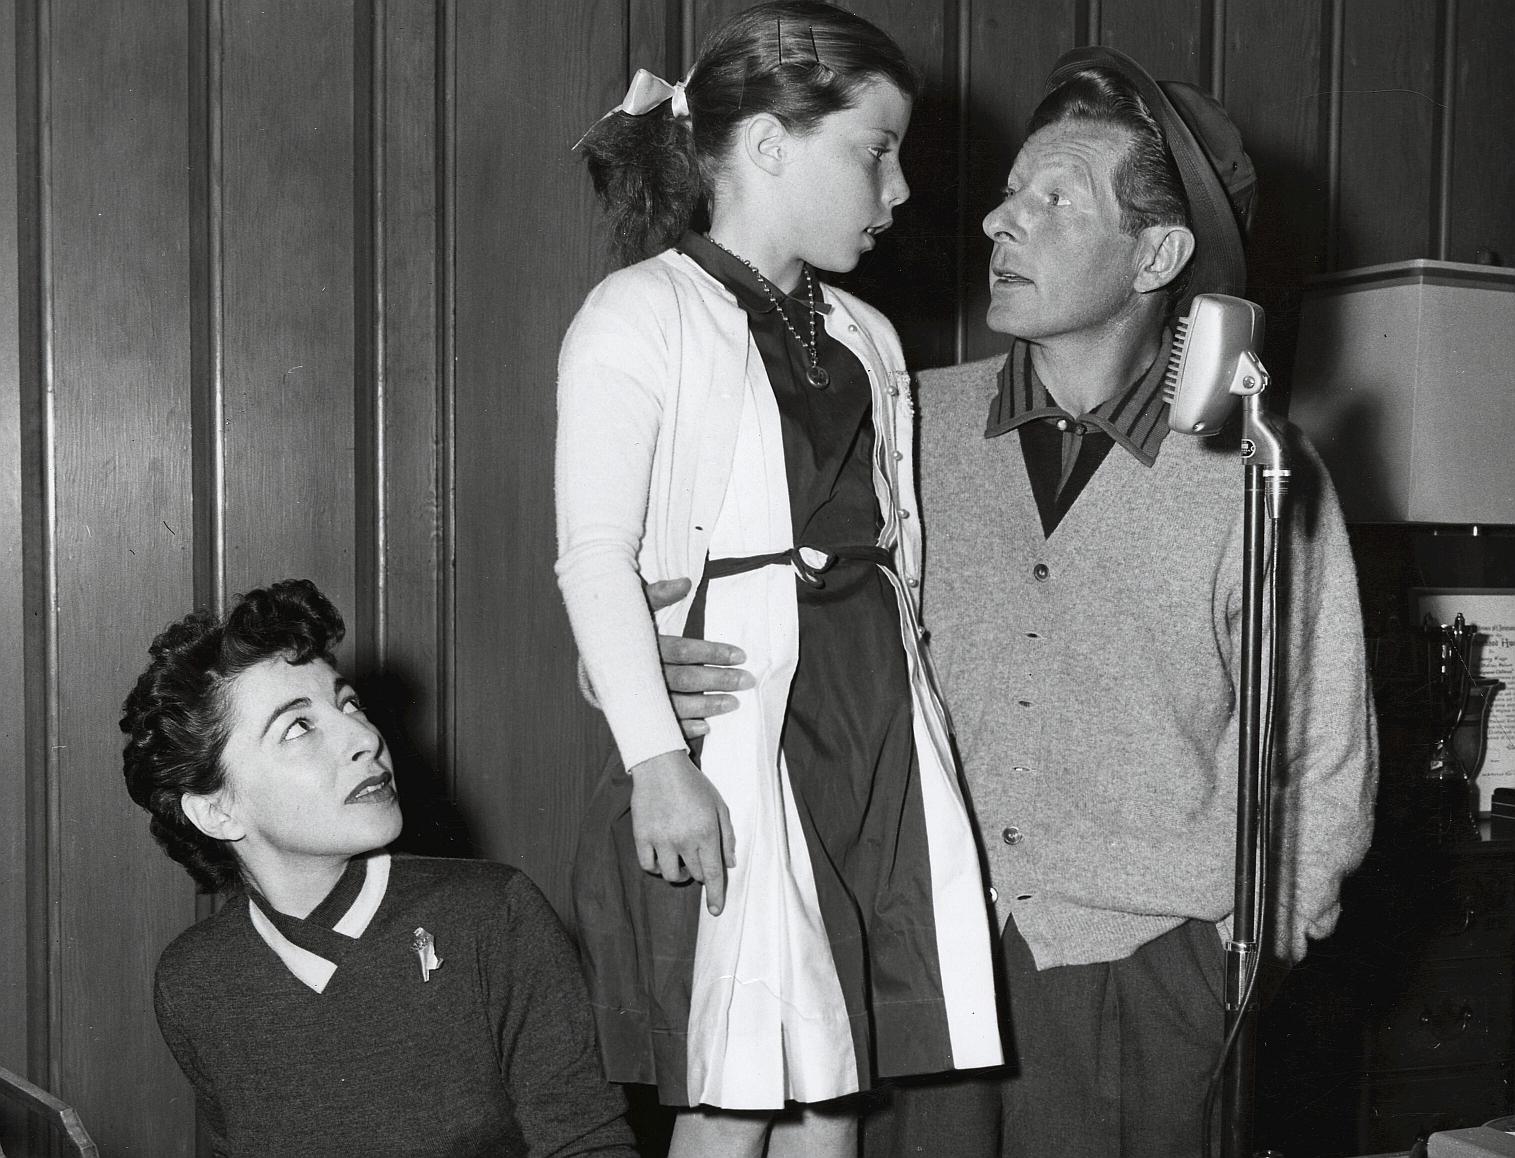 DVD highlights talents of Danny Kaye